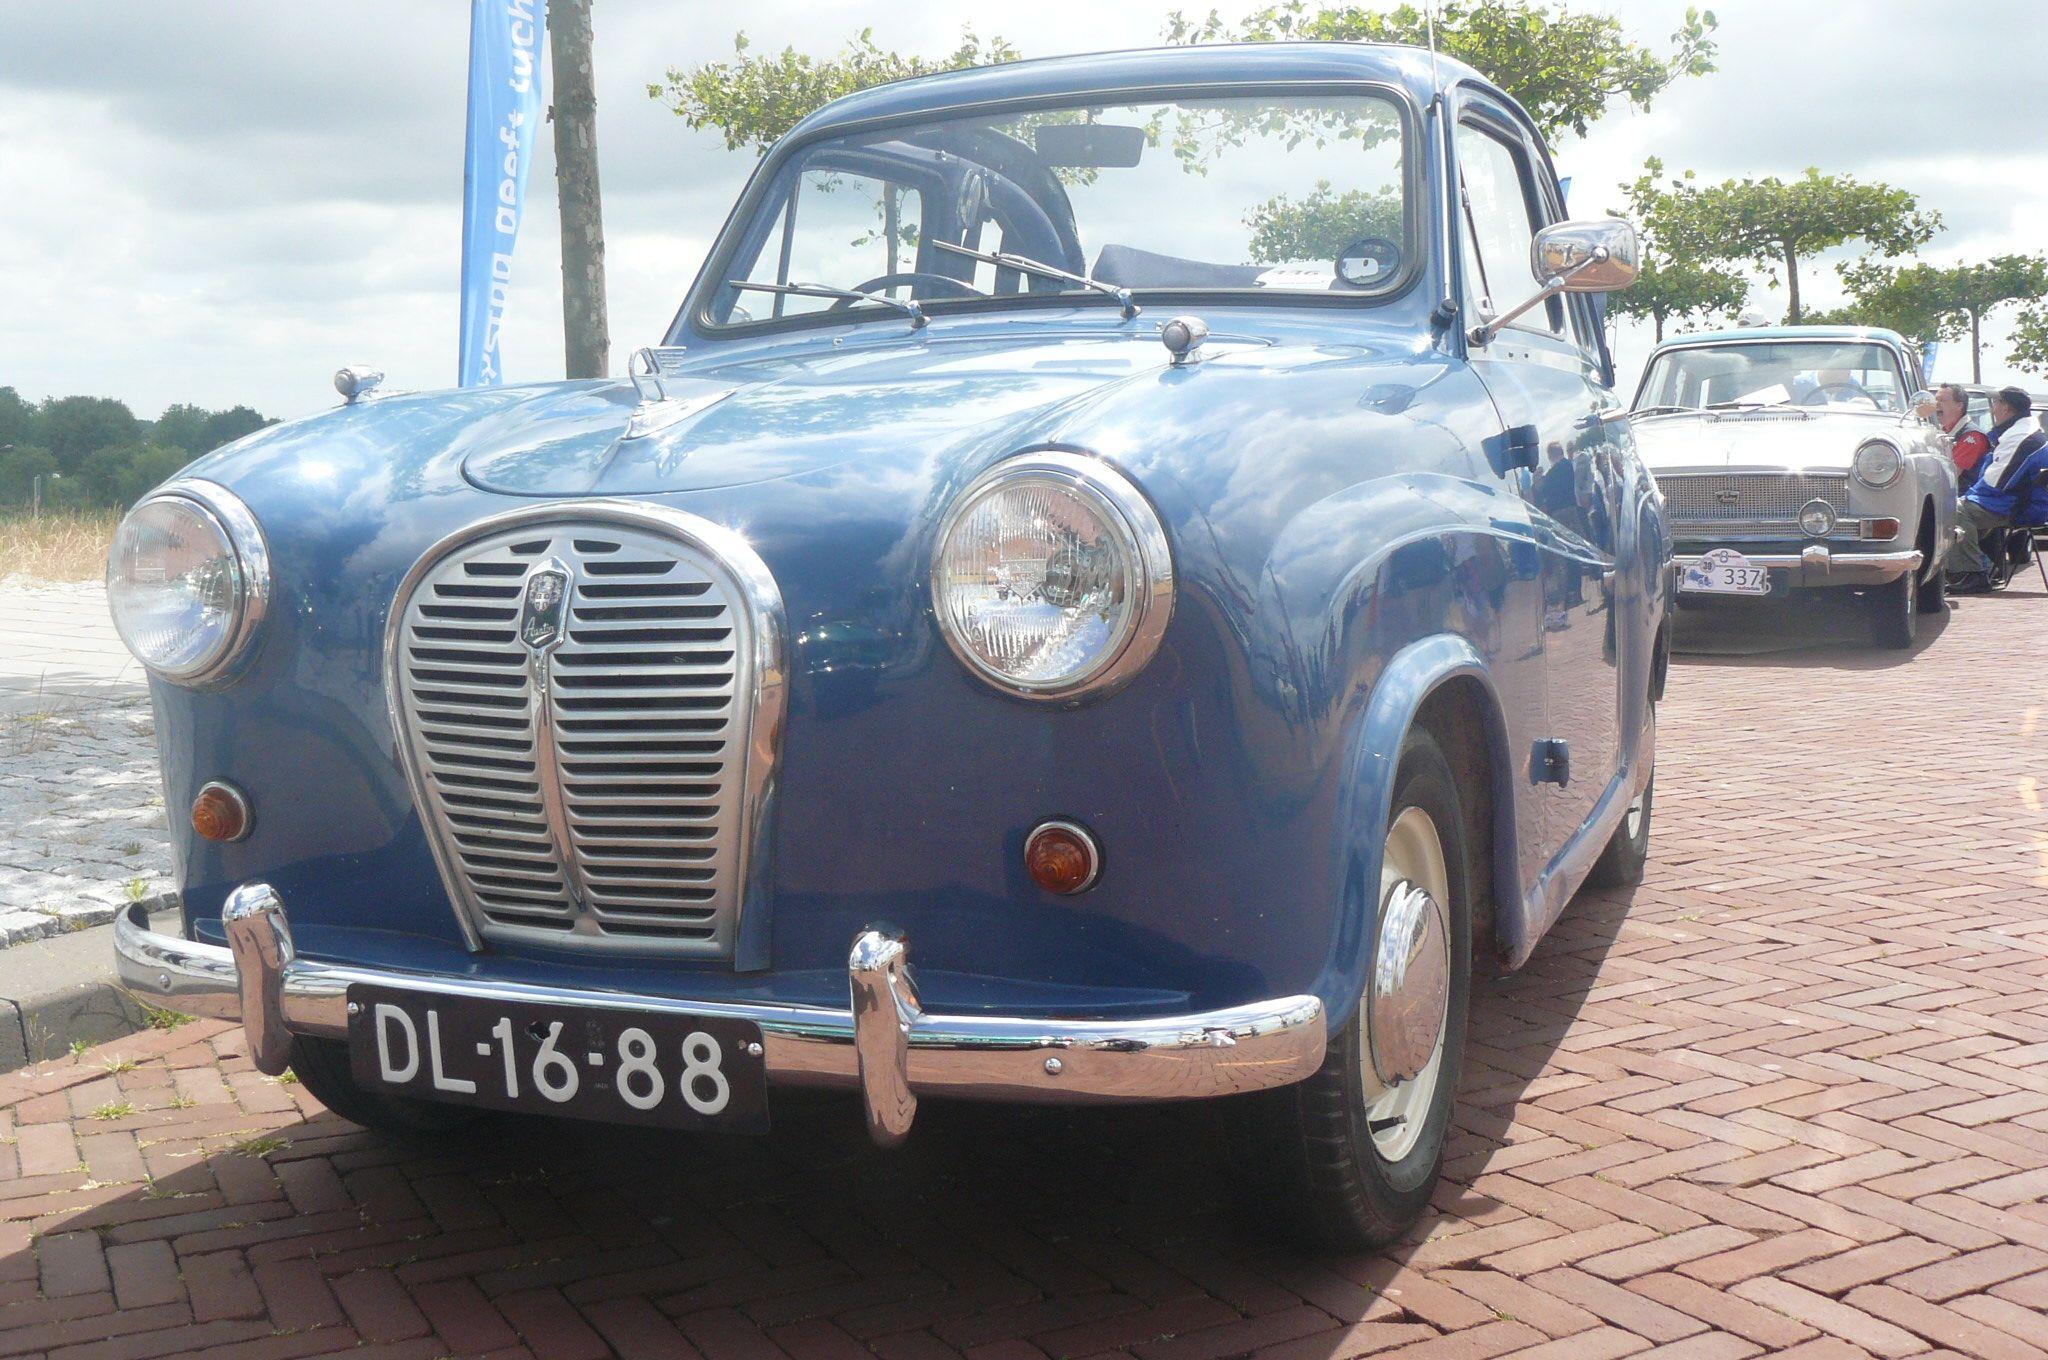 1959 - Austin A 35 - front side (2) | vintage cars | Pinterest | Cars